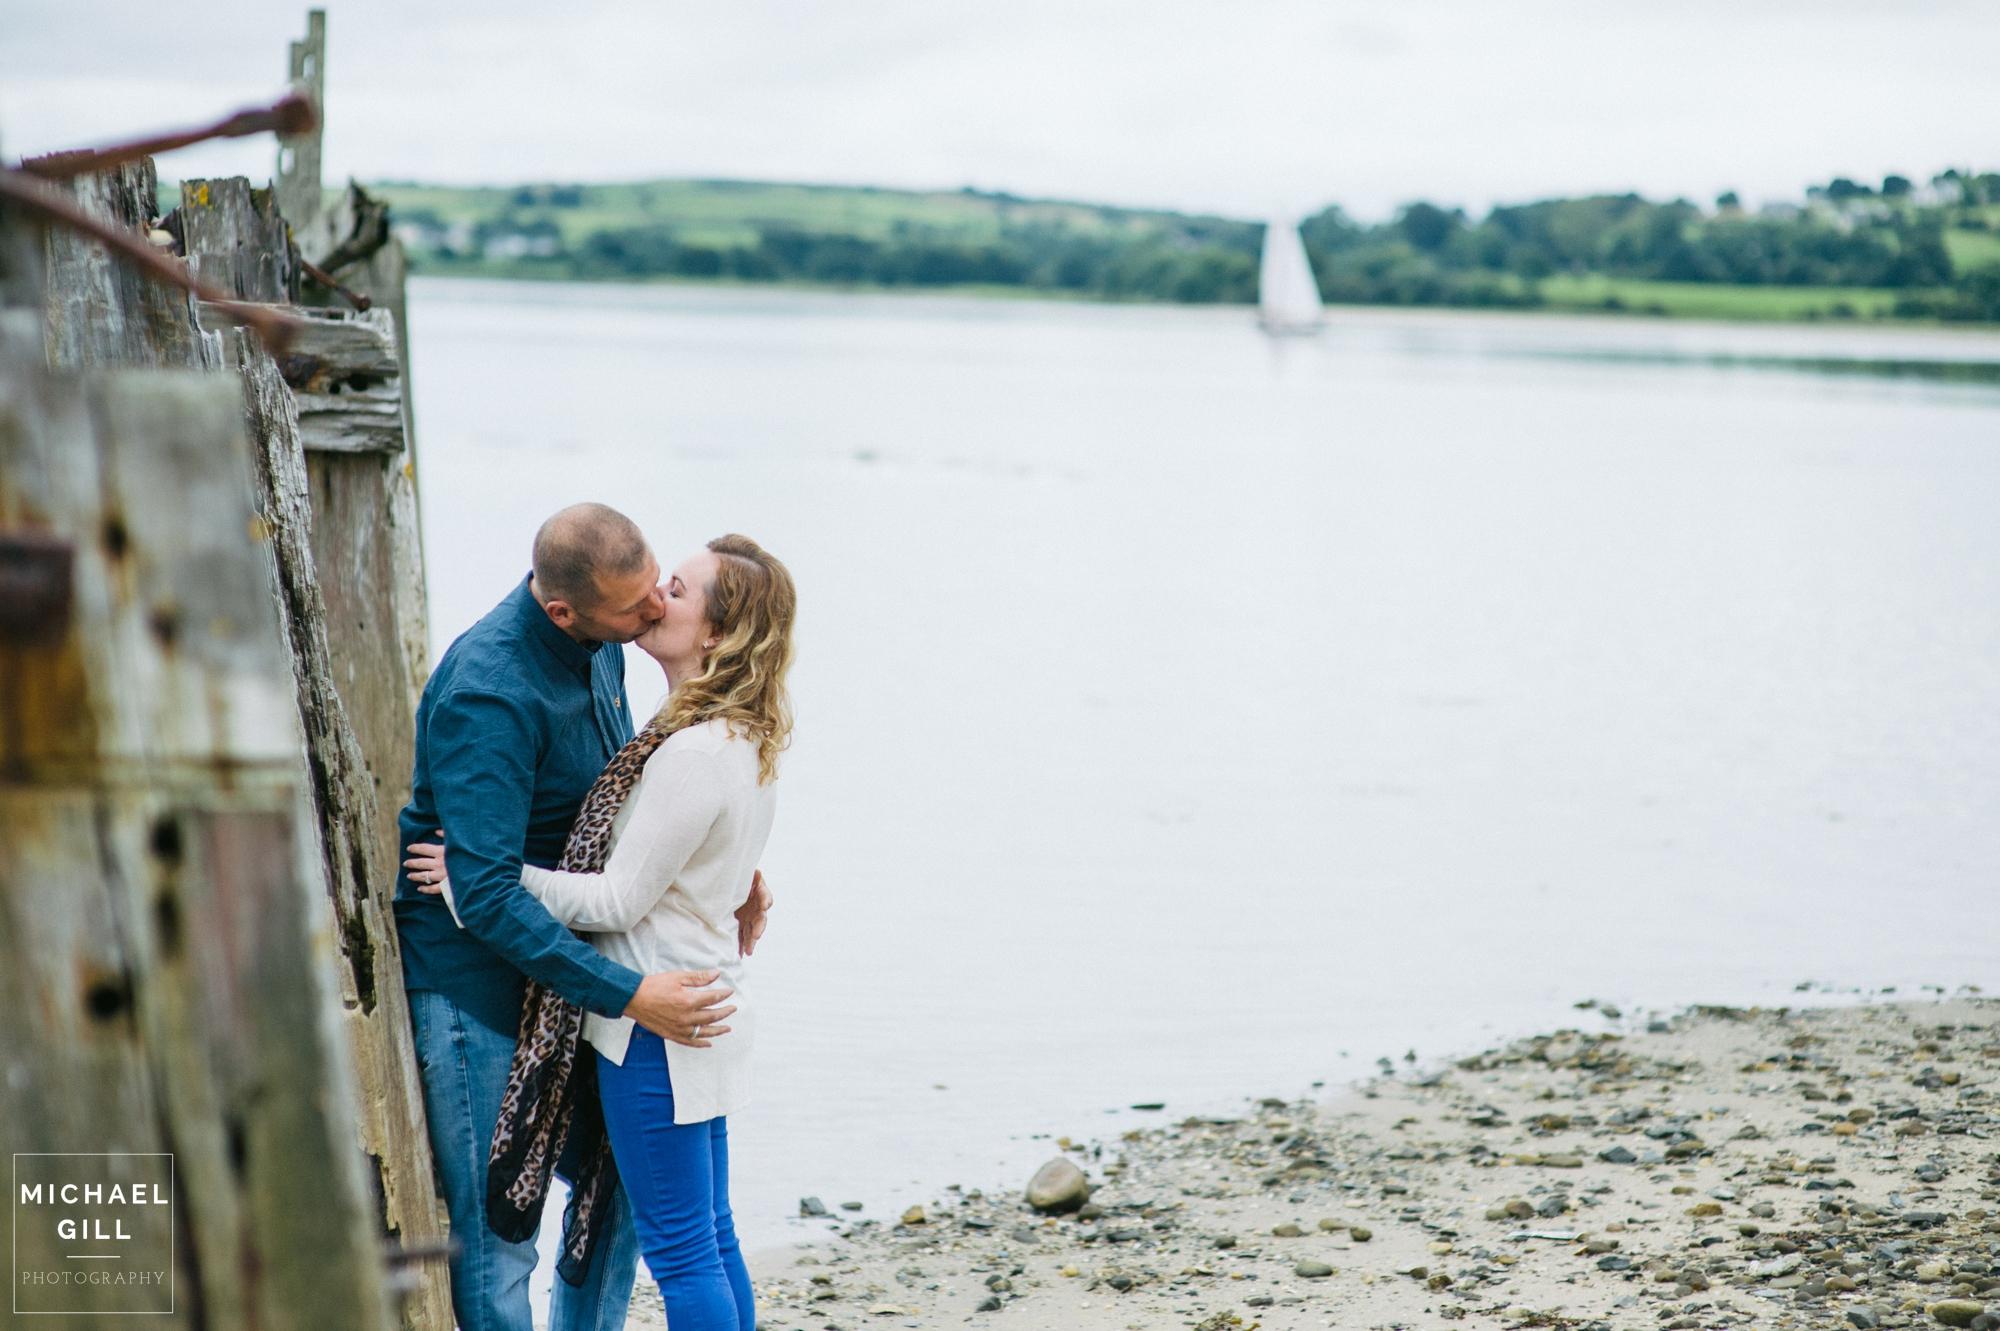 Michael_Gill_Photography_Red_Door_ Engagement-4573.jpg